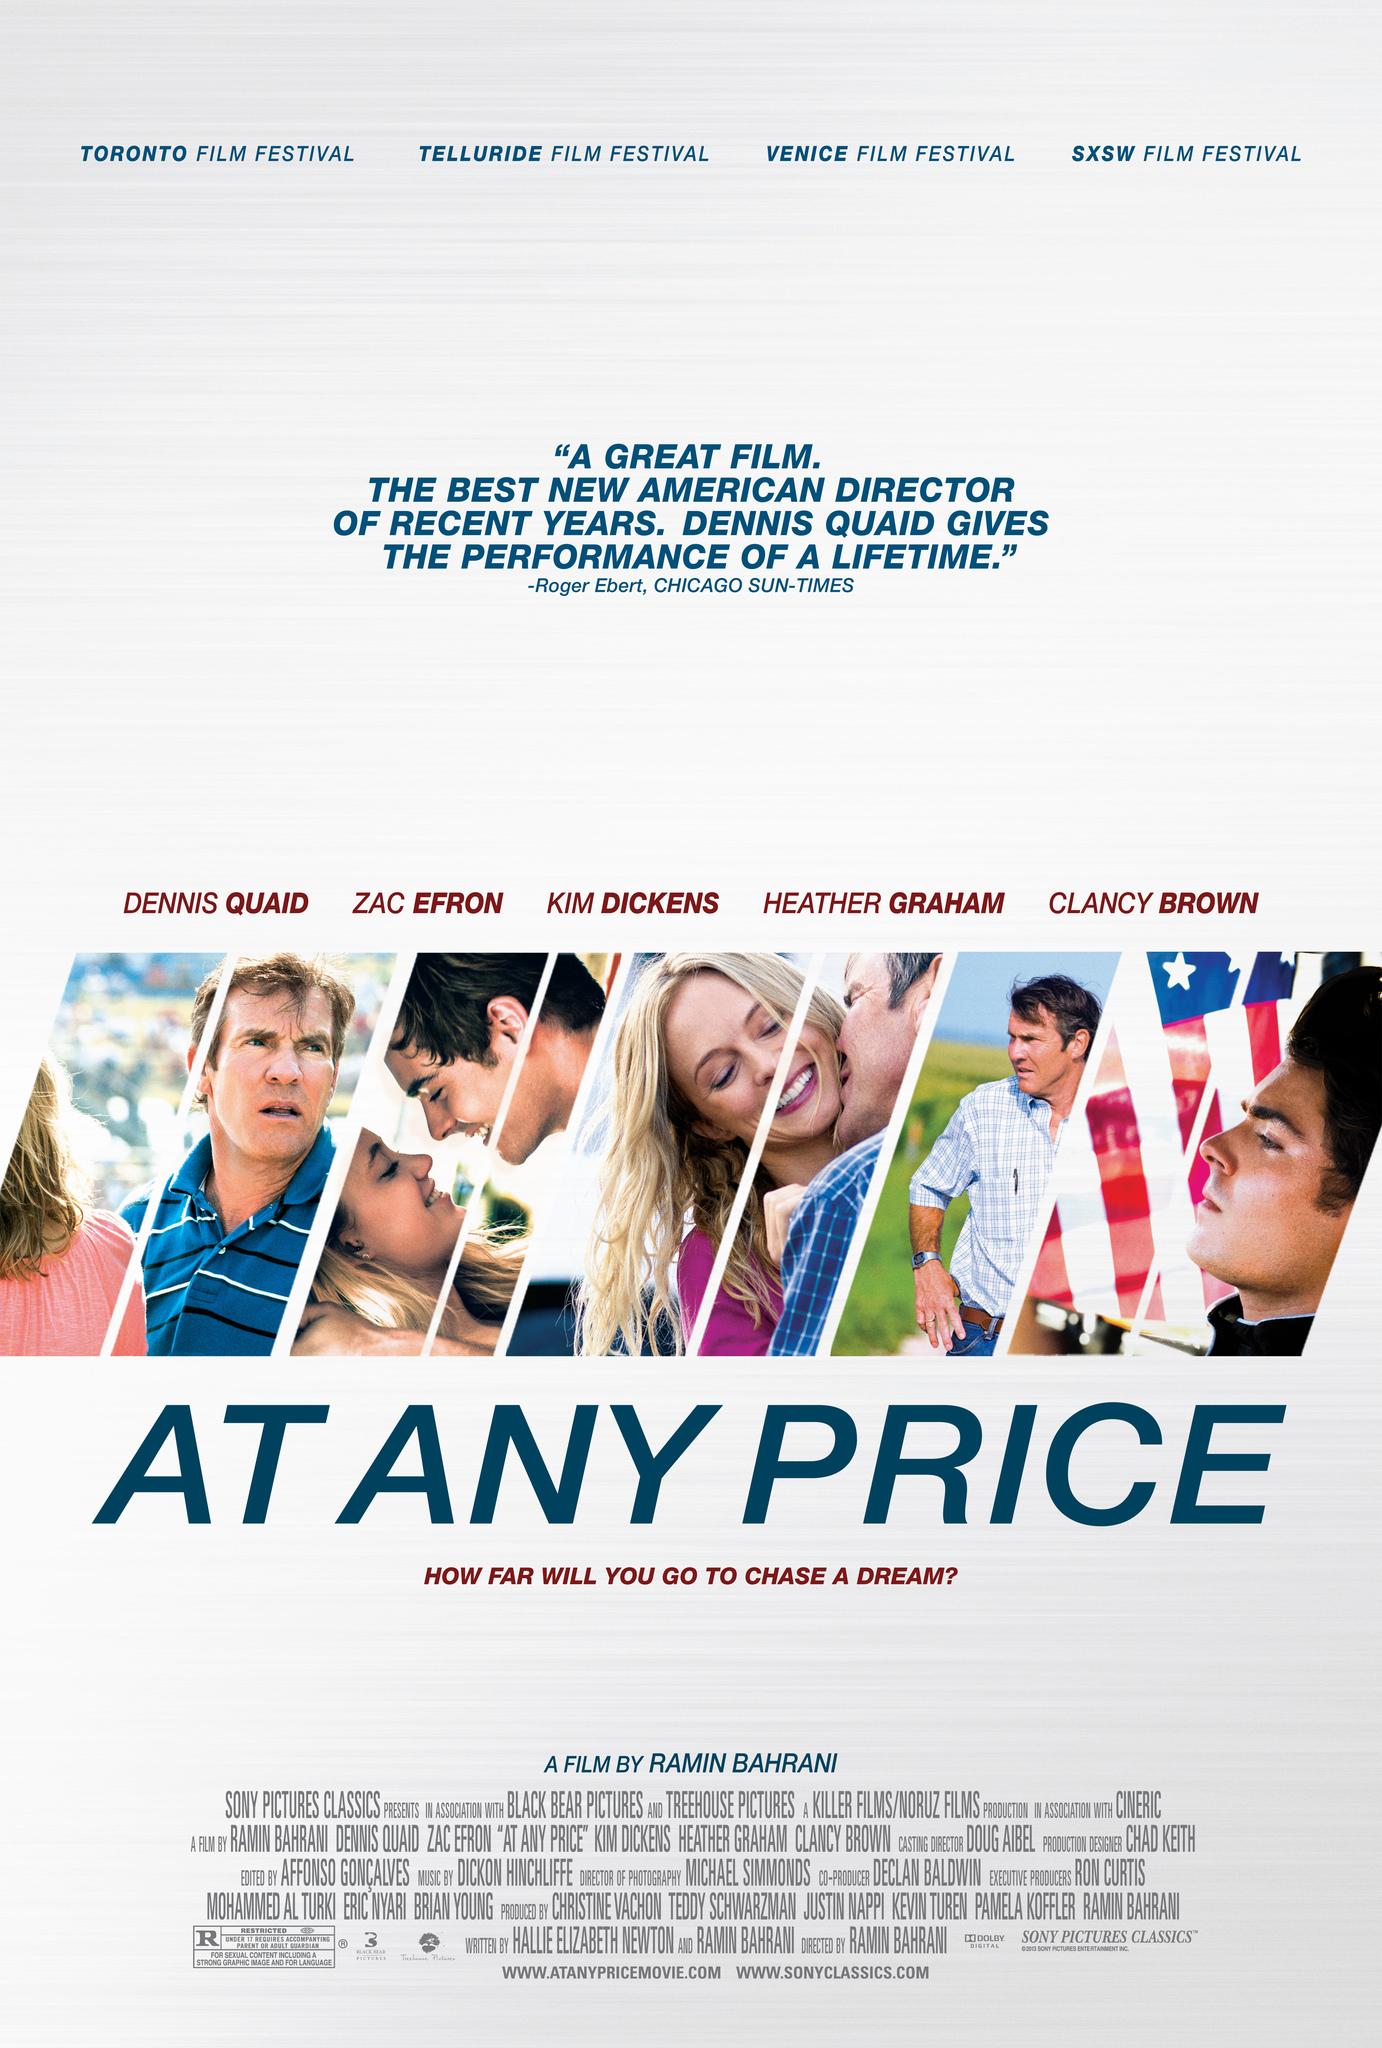 At Any Price - IMDbPro